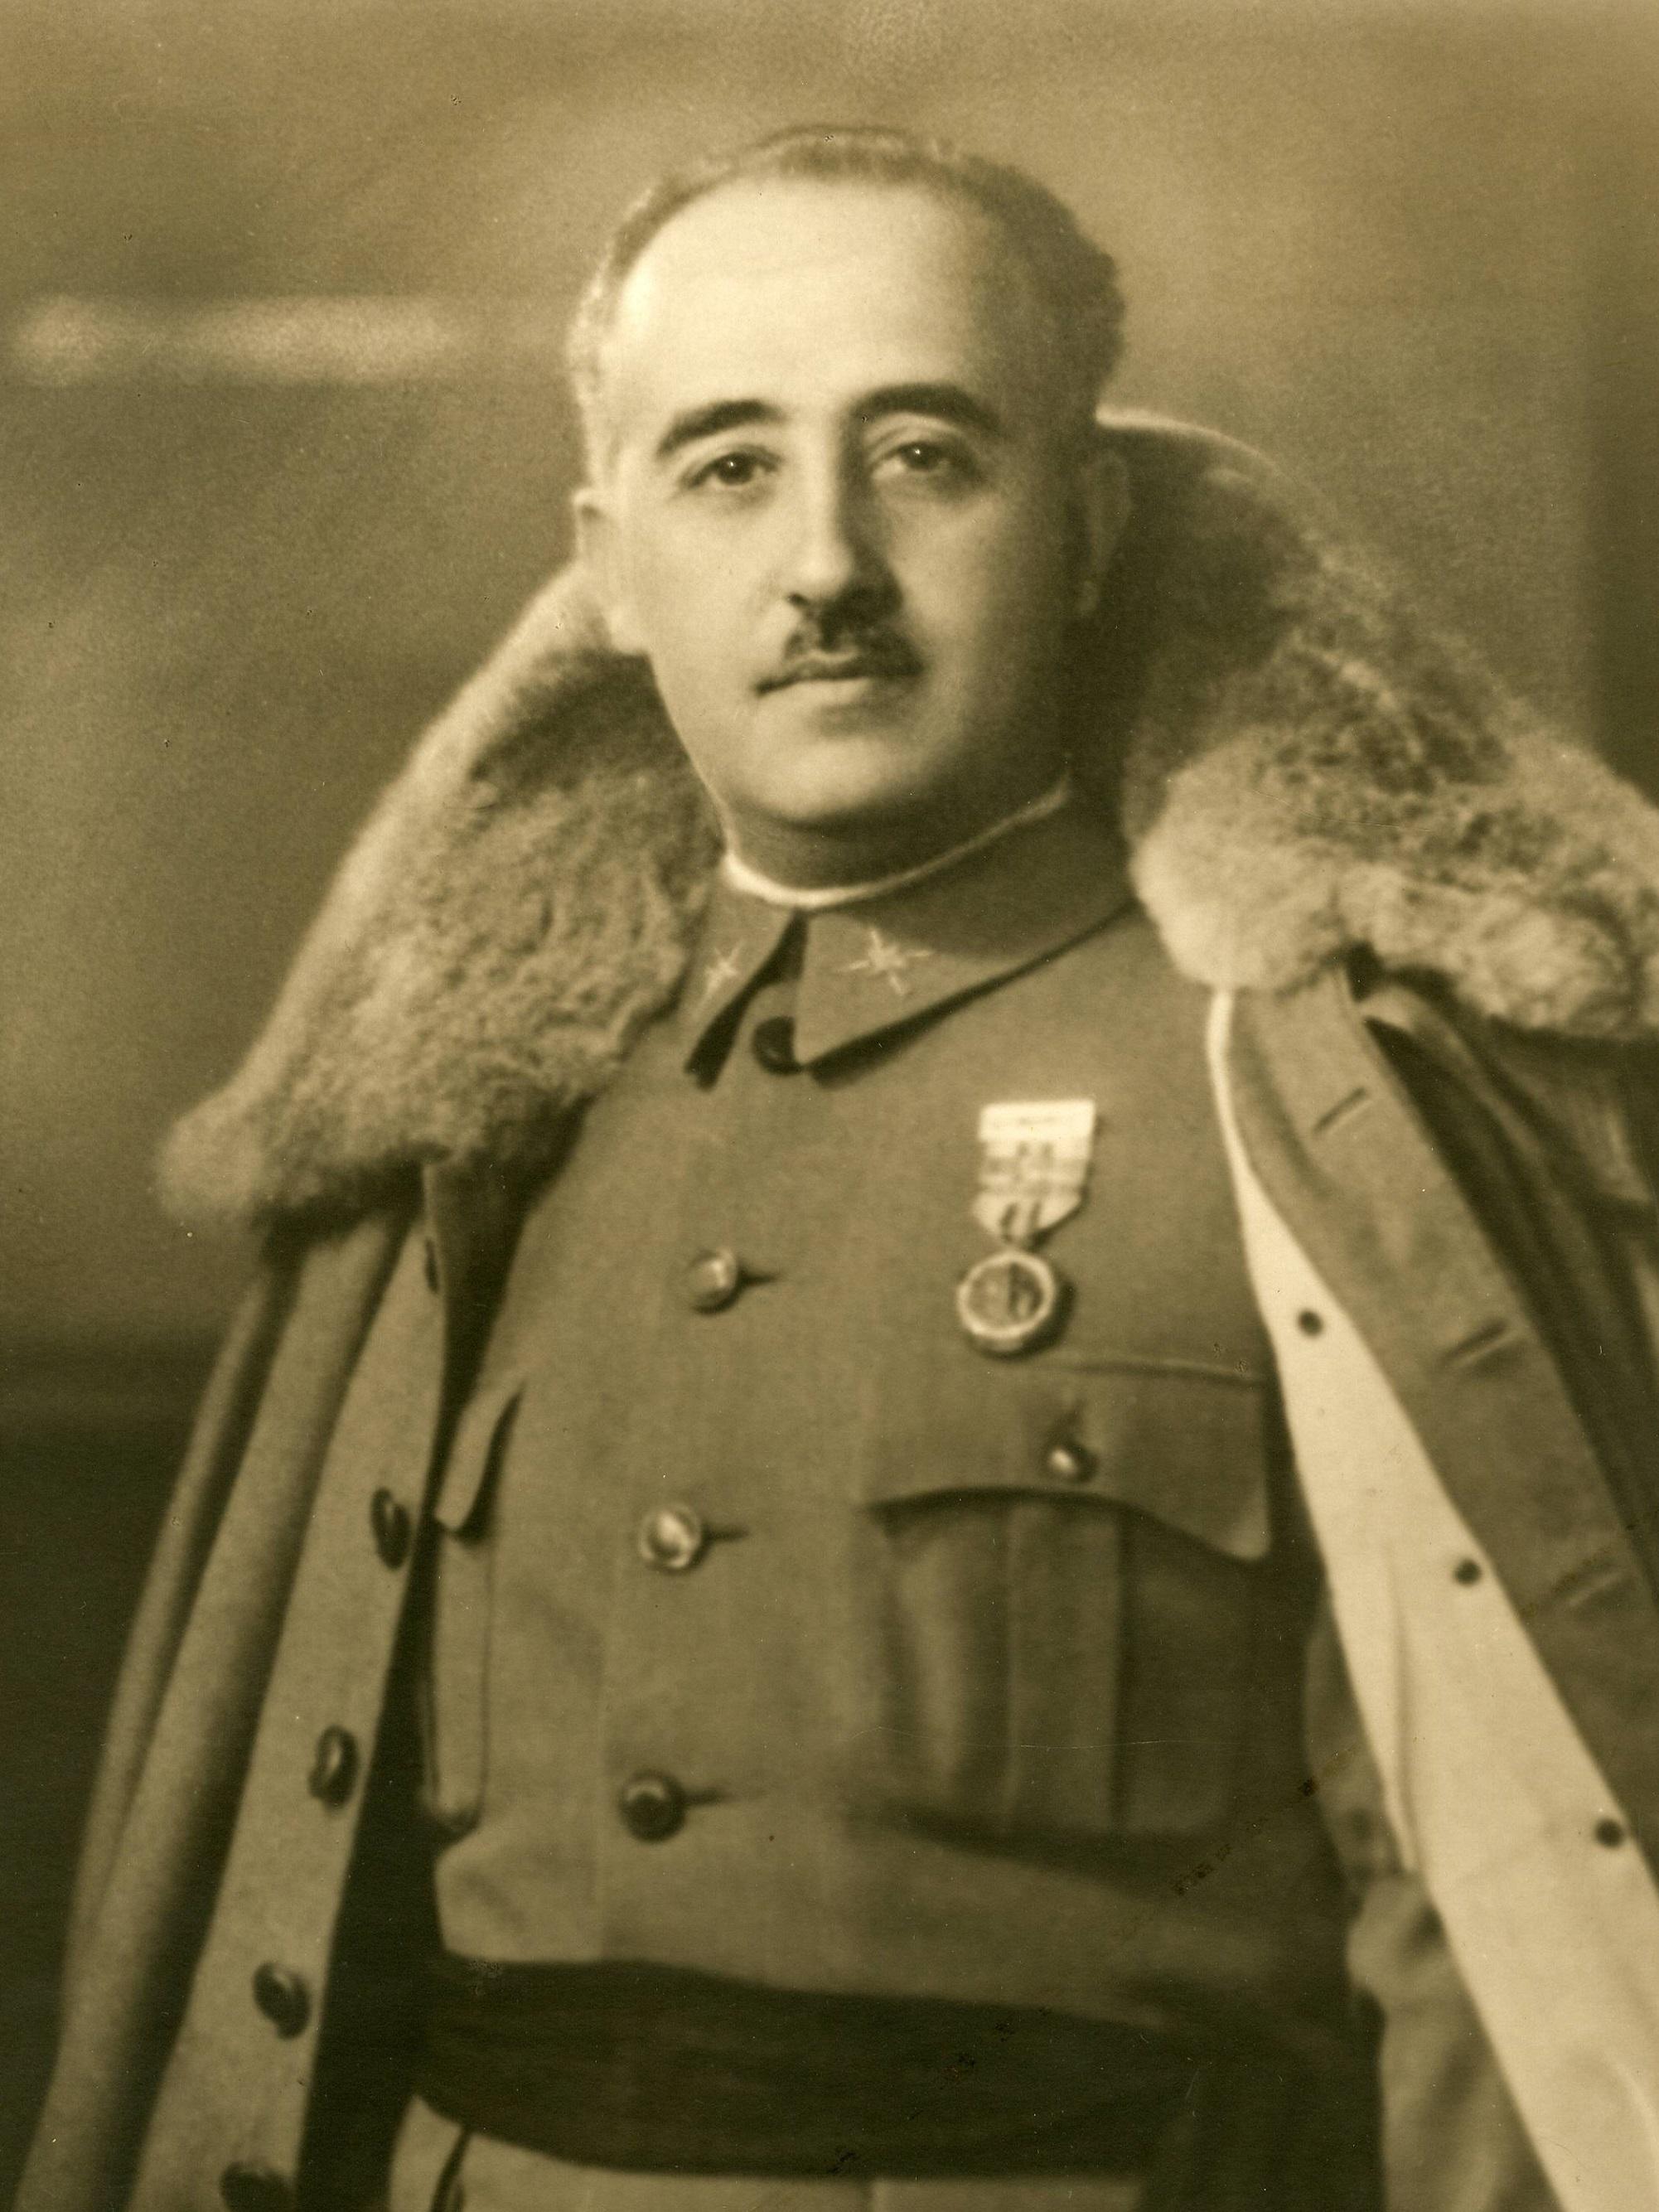 File:Francisco Franco 1930 (cropped).jpg - Wikimedia Commons